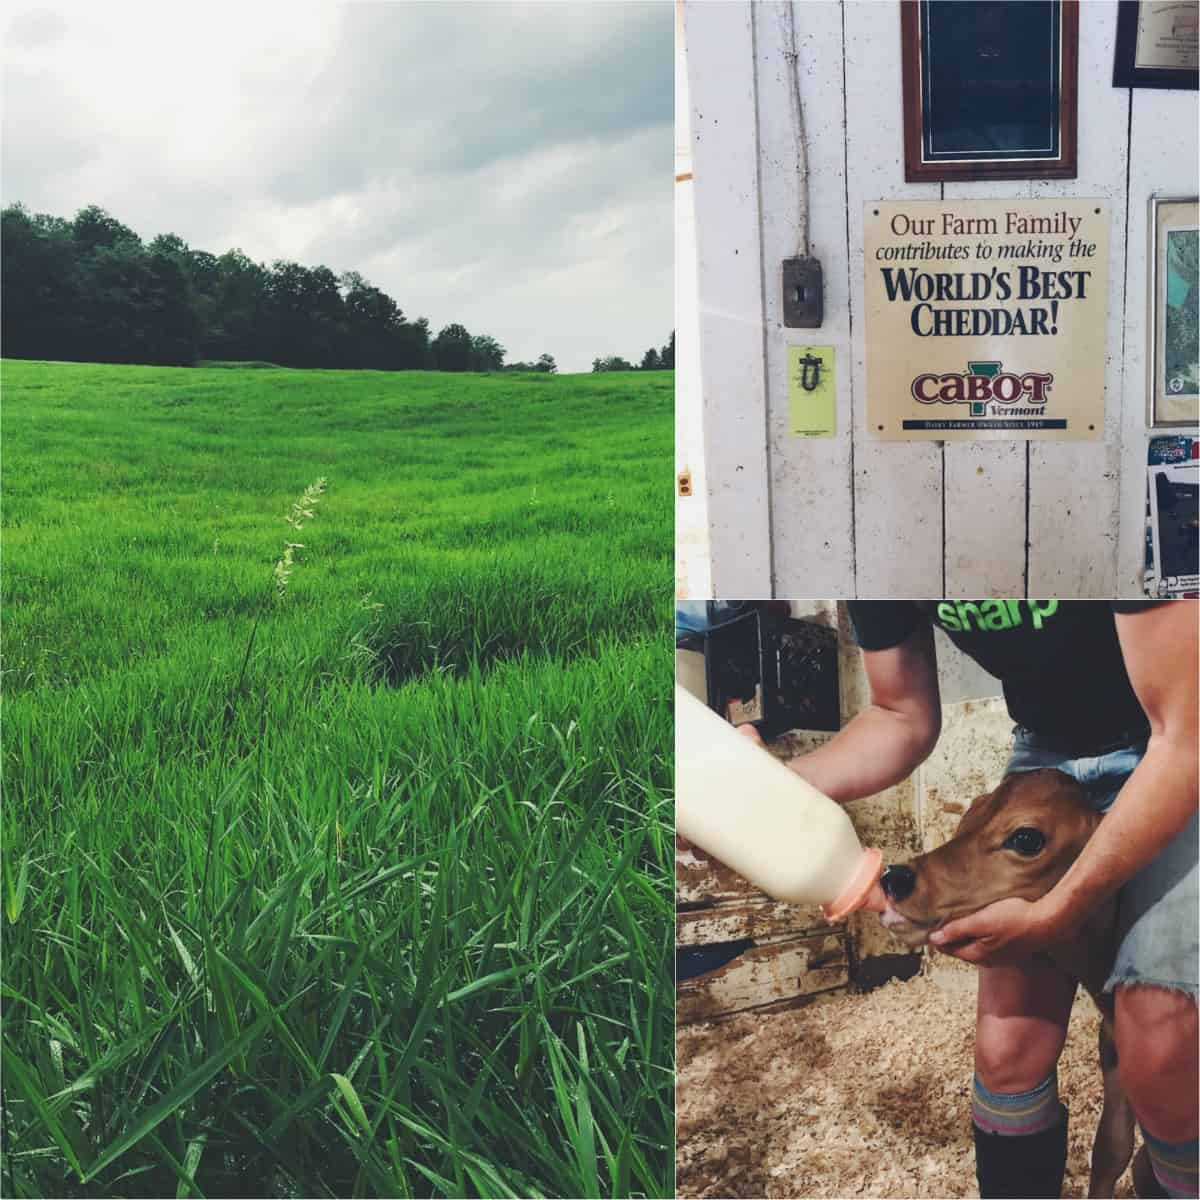 Scenes from Richardson Farm in Woodstock, VT